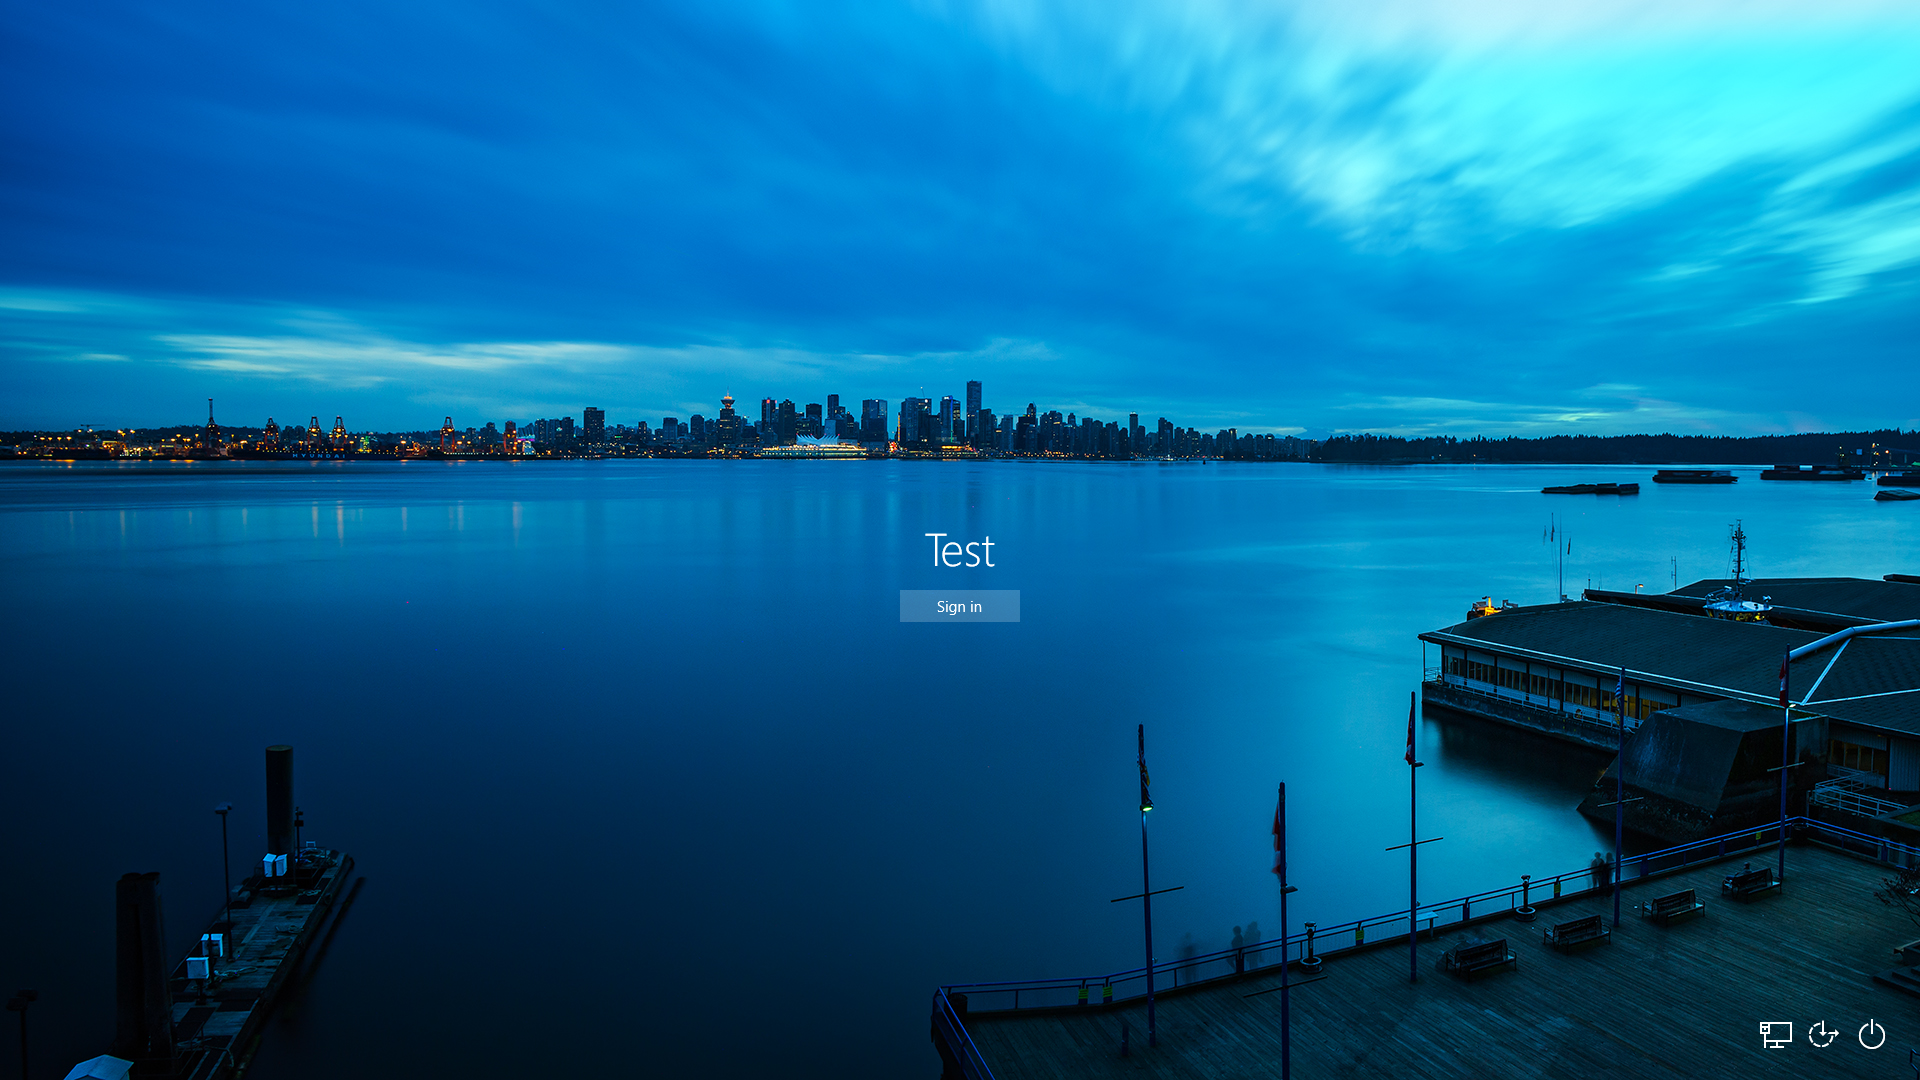 Windows 10 Background Wallpaper Slideshow